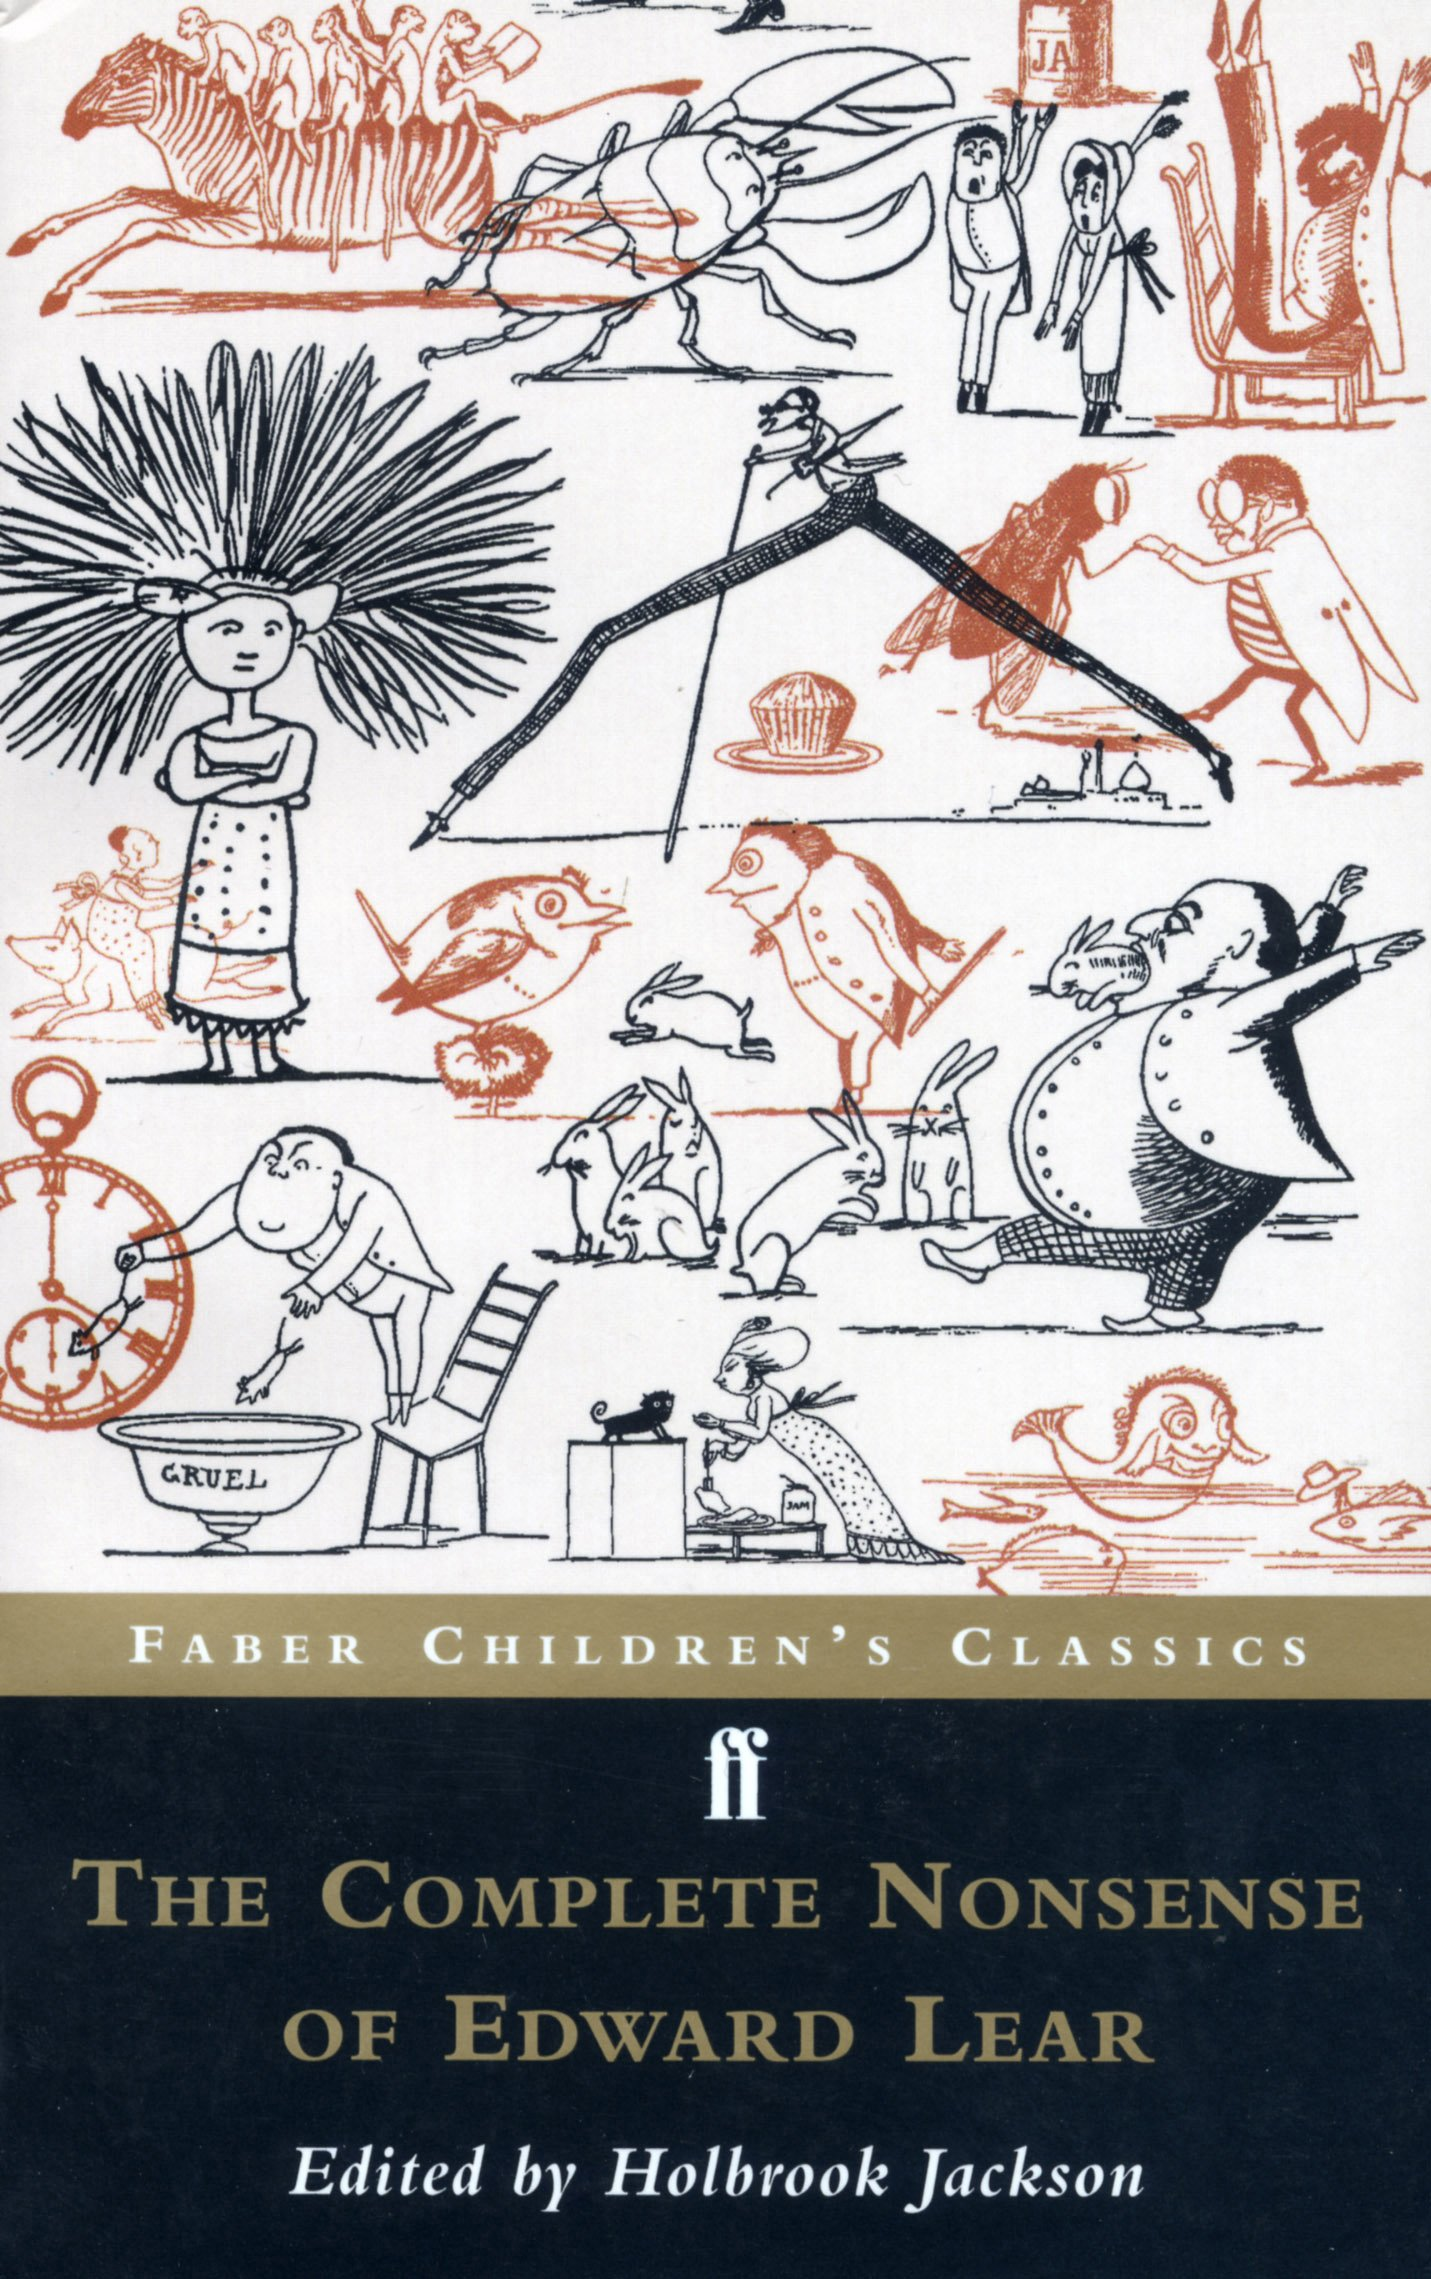 The Complete Nonsense of Edward Lear FF Childrens Classics: Amazon ...